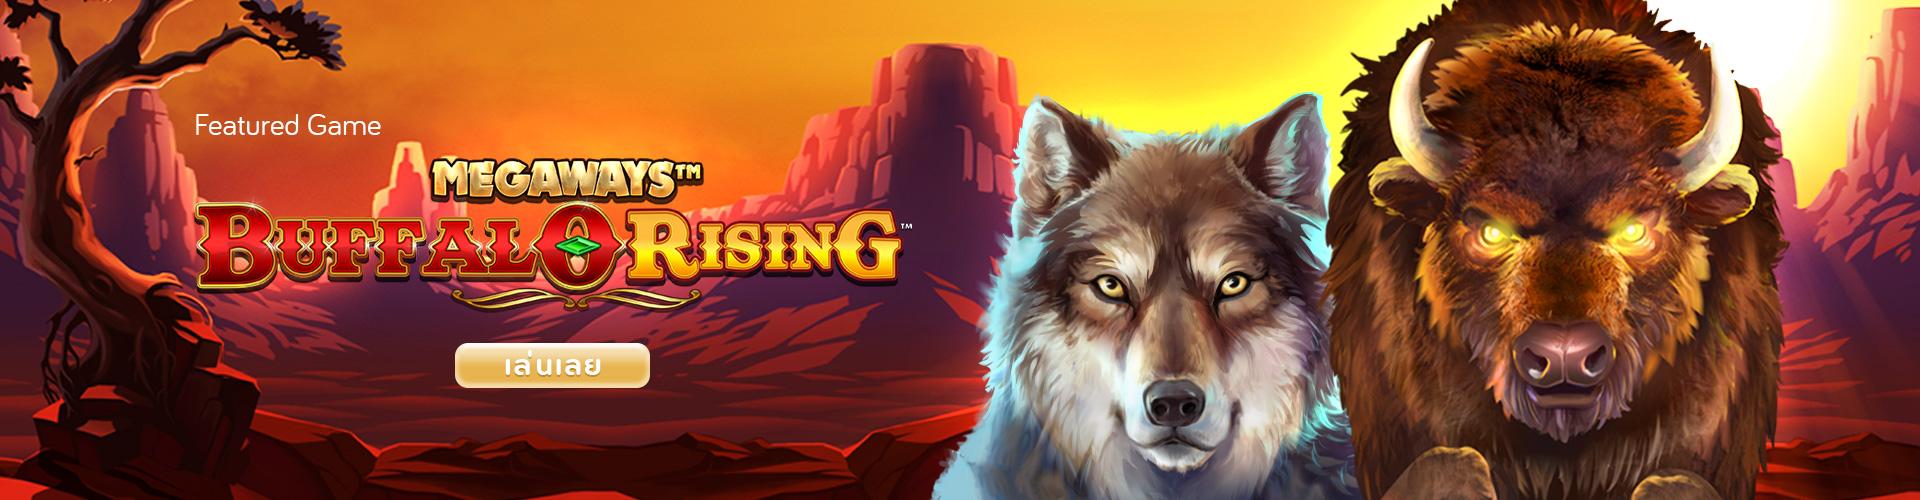 BluePrint Gaming ค่ายเกมคาสิโนออนไลน์ที่อัดแน่นไปด้วยคุณภาพ Banner